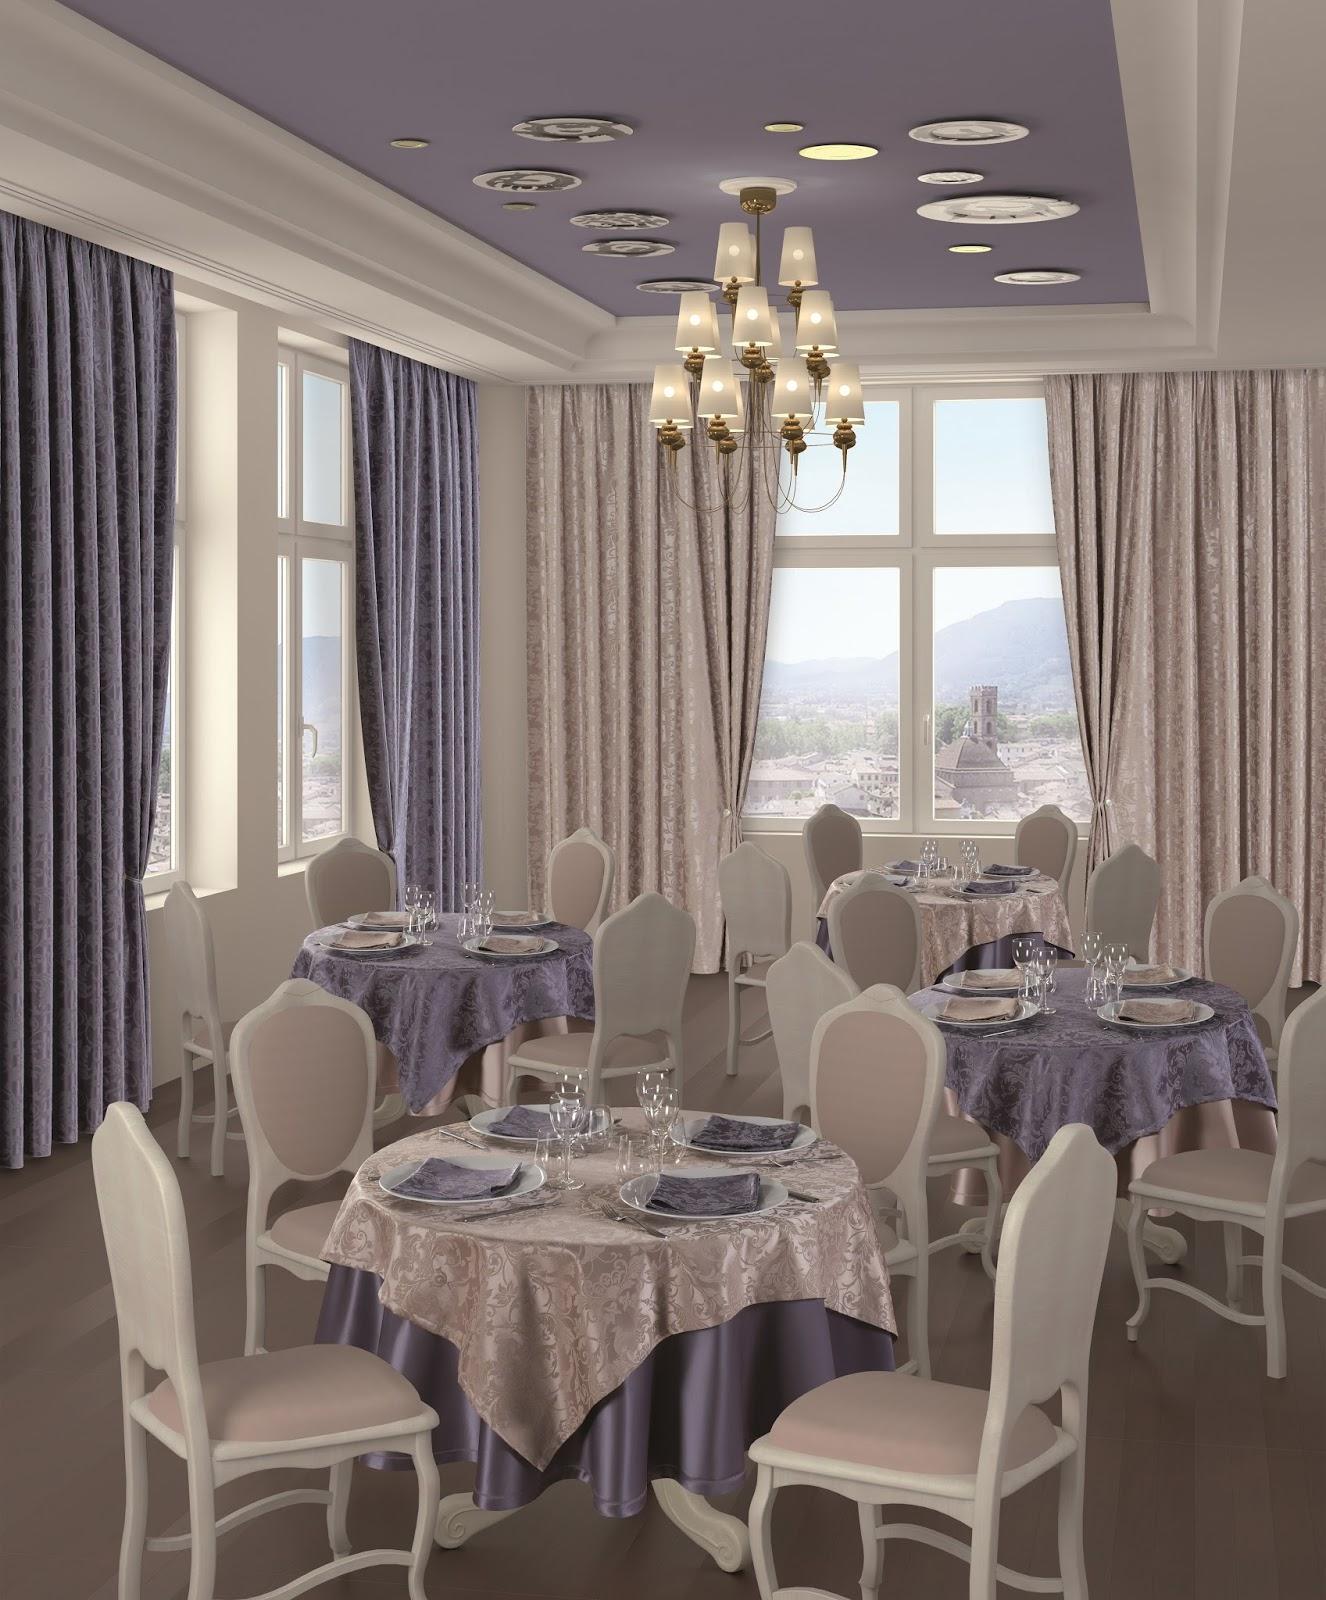 Fete de masa - restaurant - Noblese